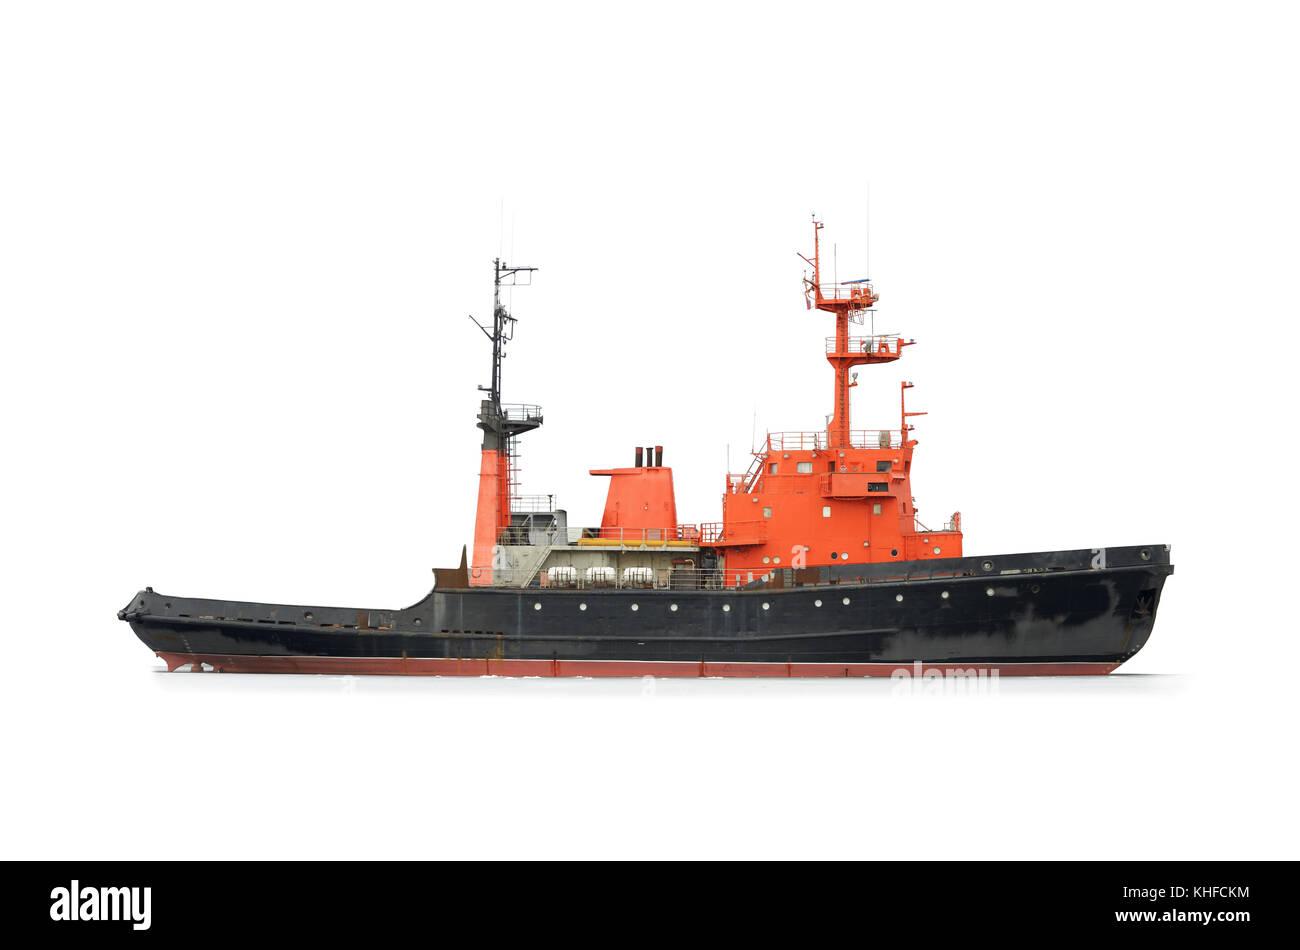 Marine vehicle designed to operate at sea. - Stock Image